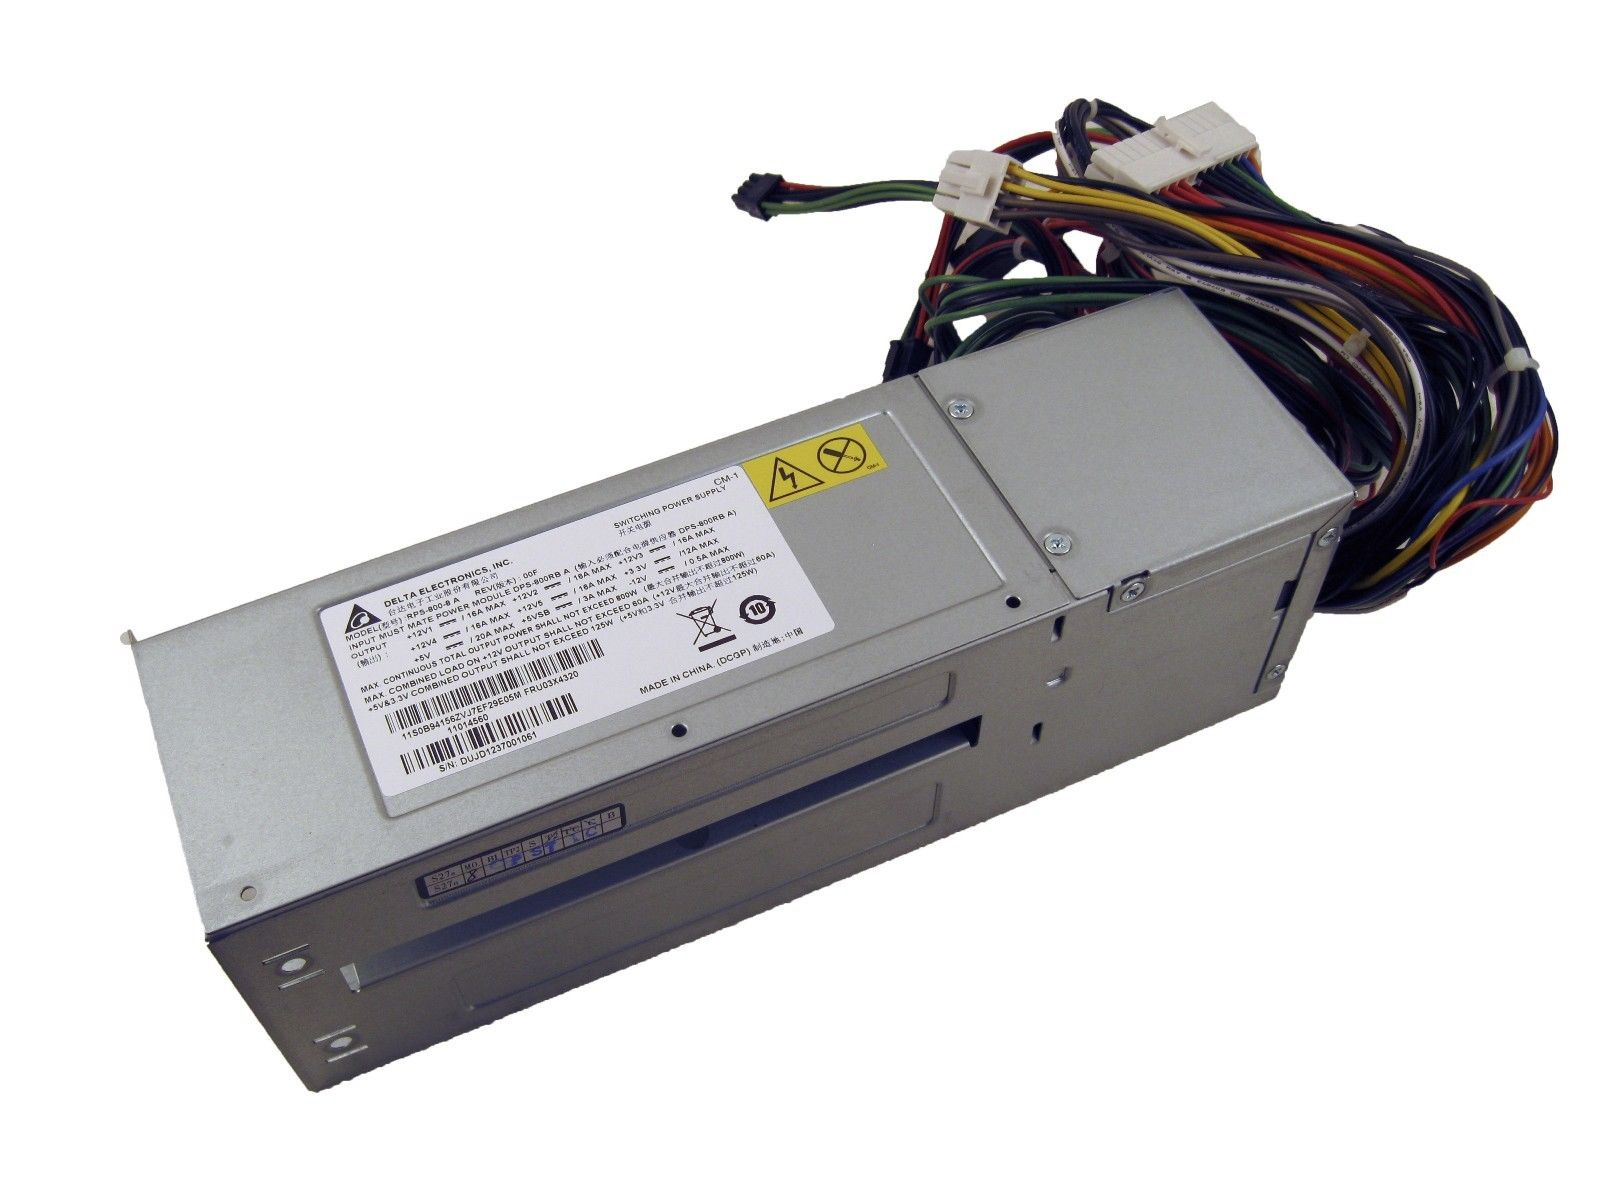 IBM 03X4320 Lenovo ThinkServer TD340 Empty Power Supply PSU Cage Chassis 800W